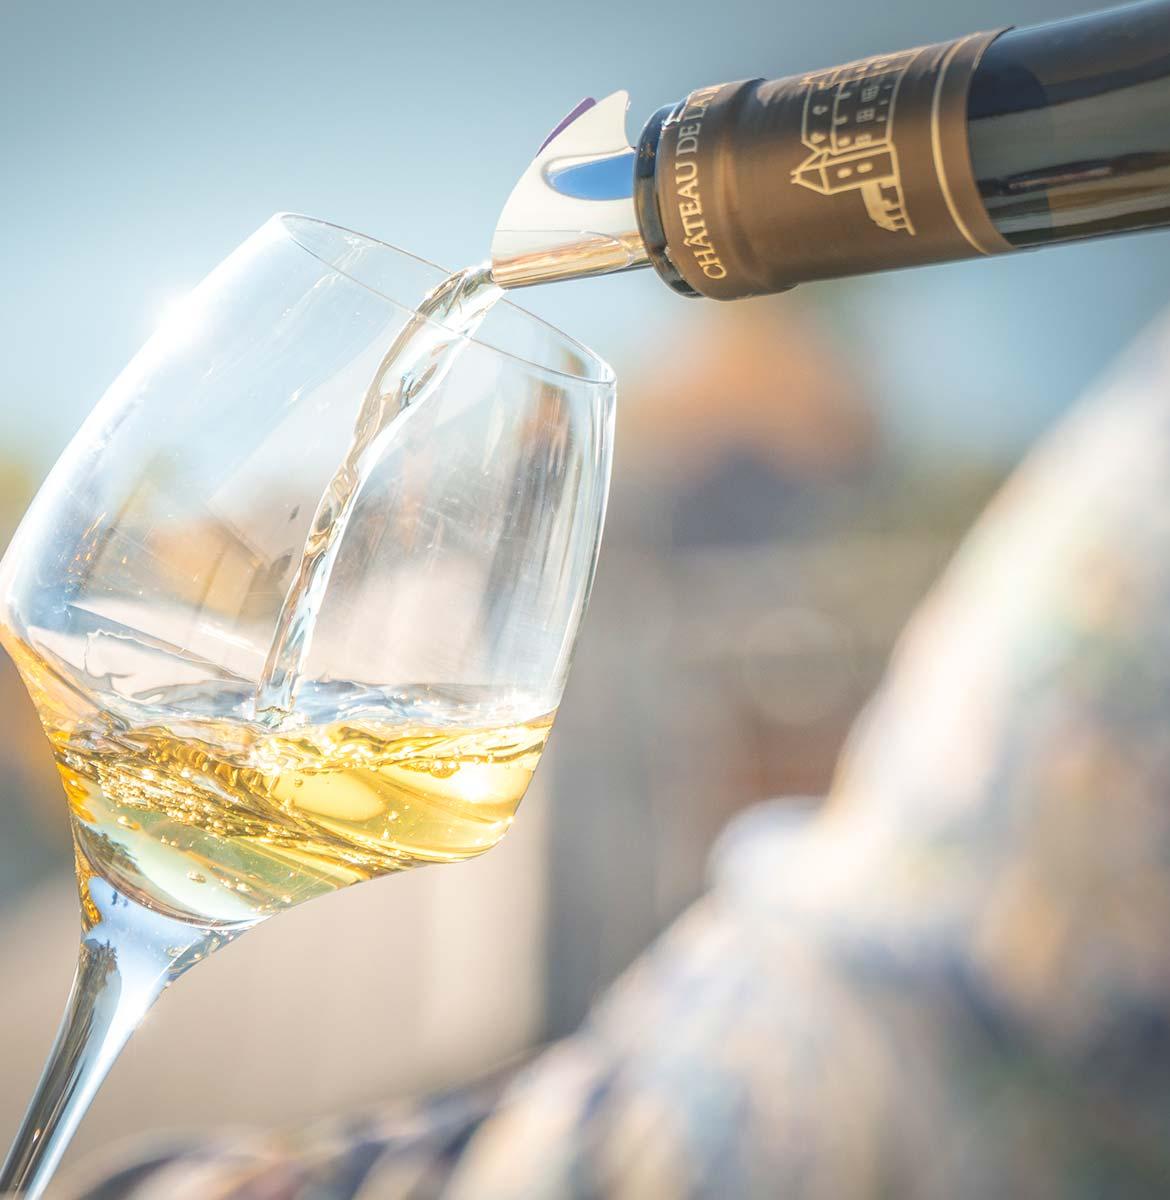 Marestel vin blanc de savoie verse dans un verre